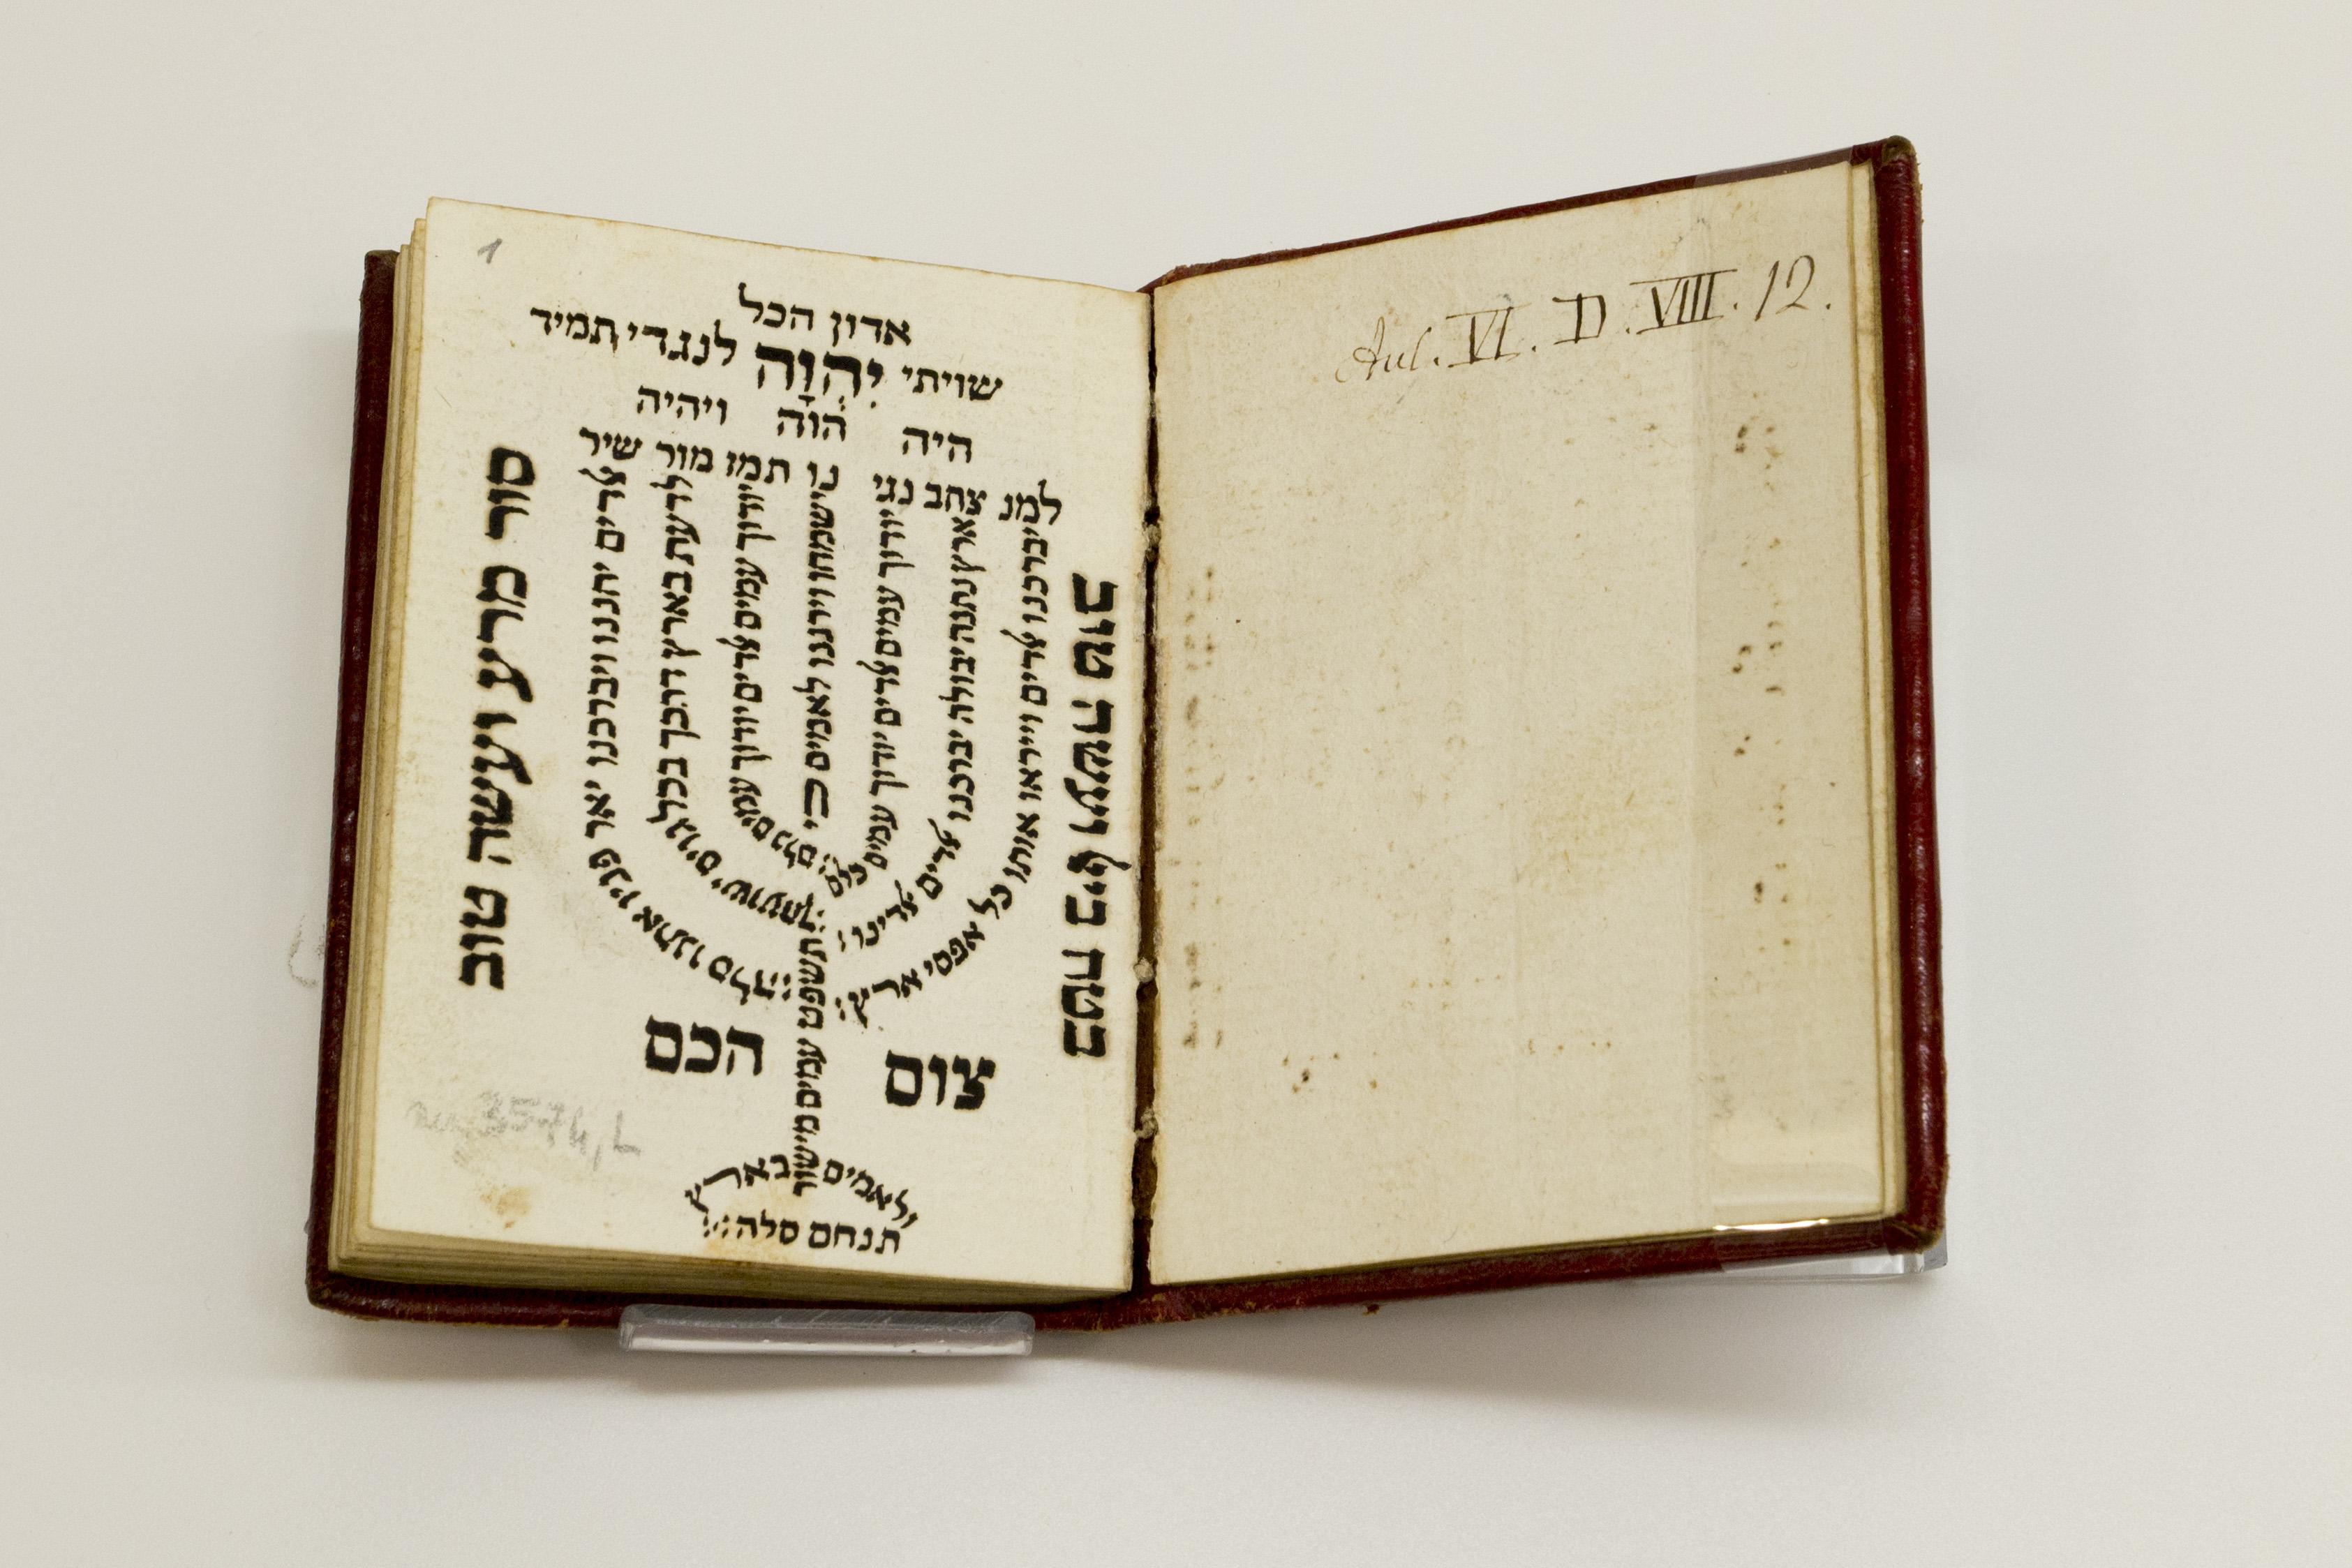 Biblioteca Universitaria di Bologna, Ebraici; ms. 3574 L